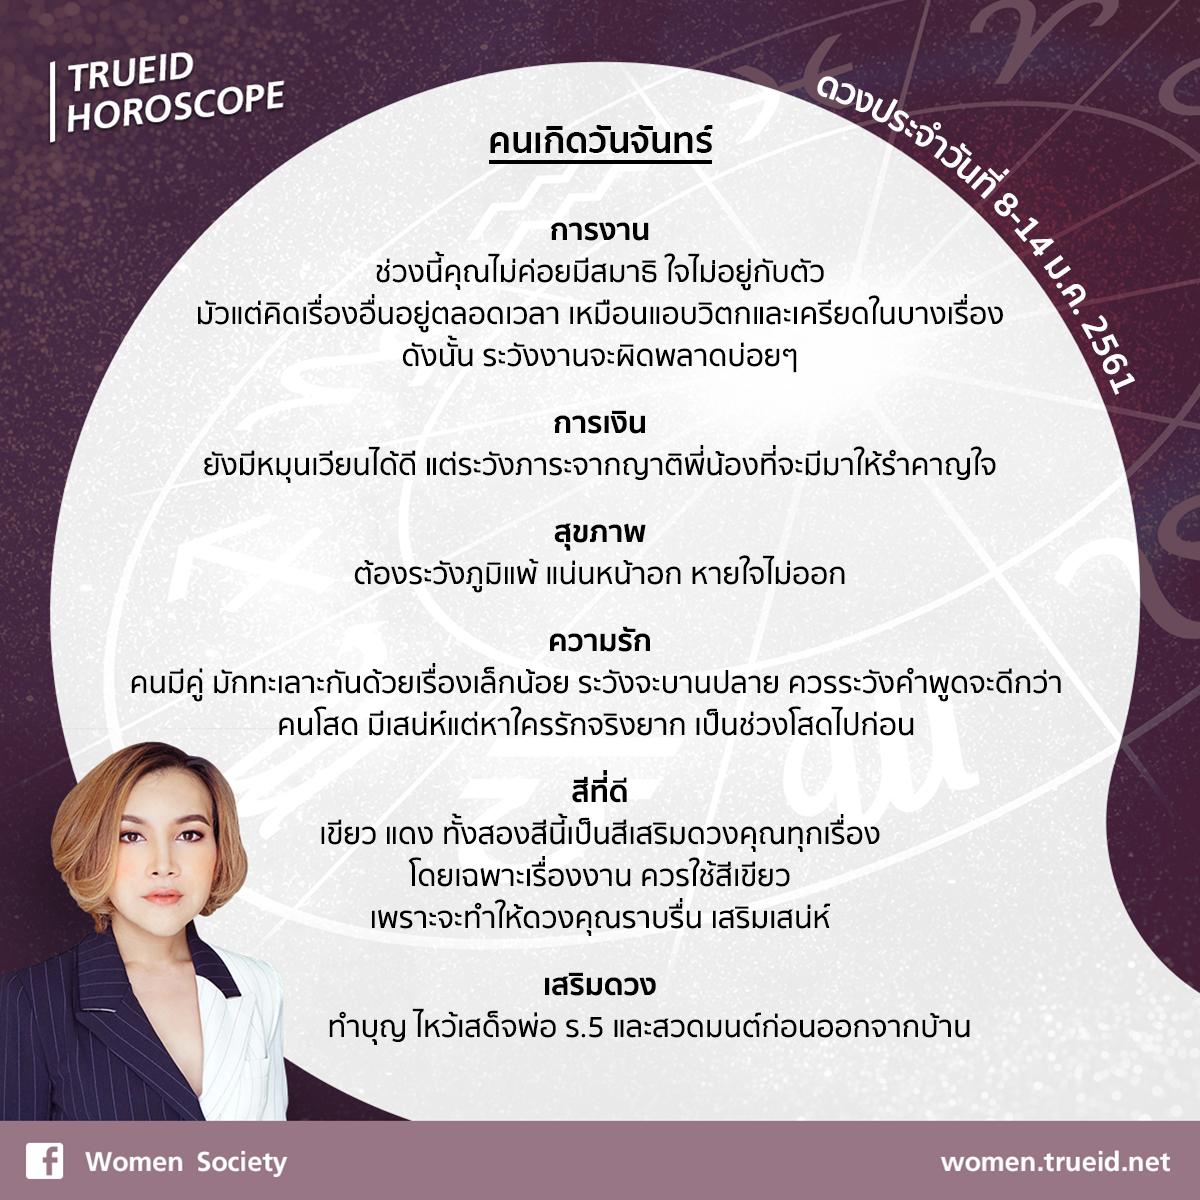 TrueID Horoscope : ดูดวง รายสัปดาห์ แม่นๆ 8-14 ม.ค. 61 โดย หมอดู Toktak A4